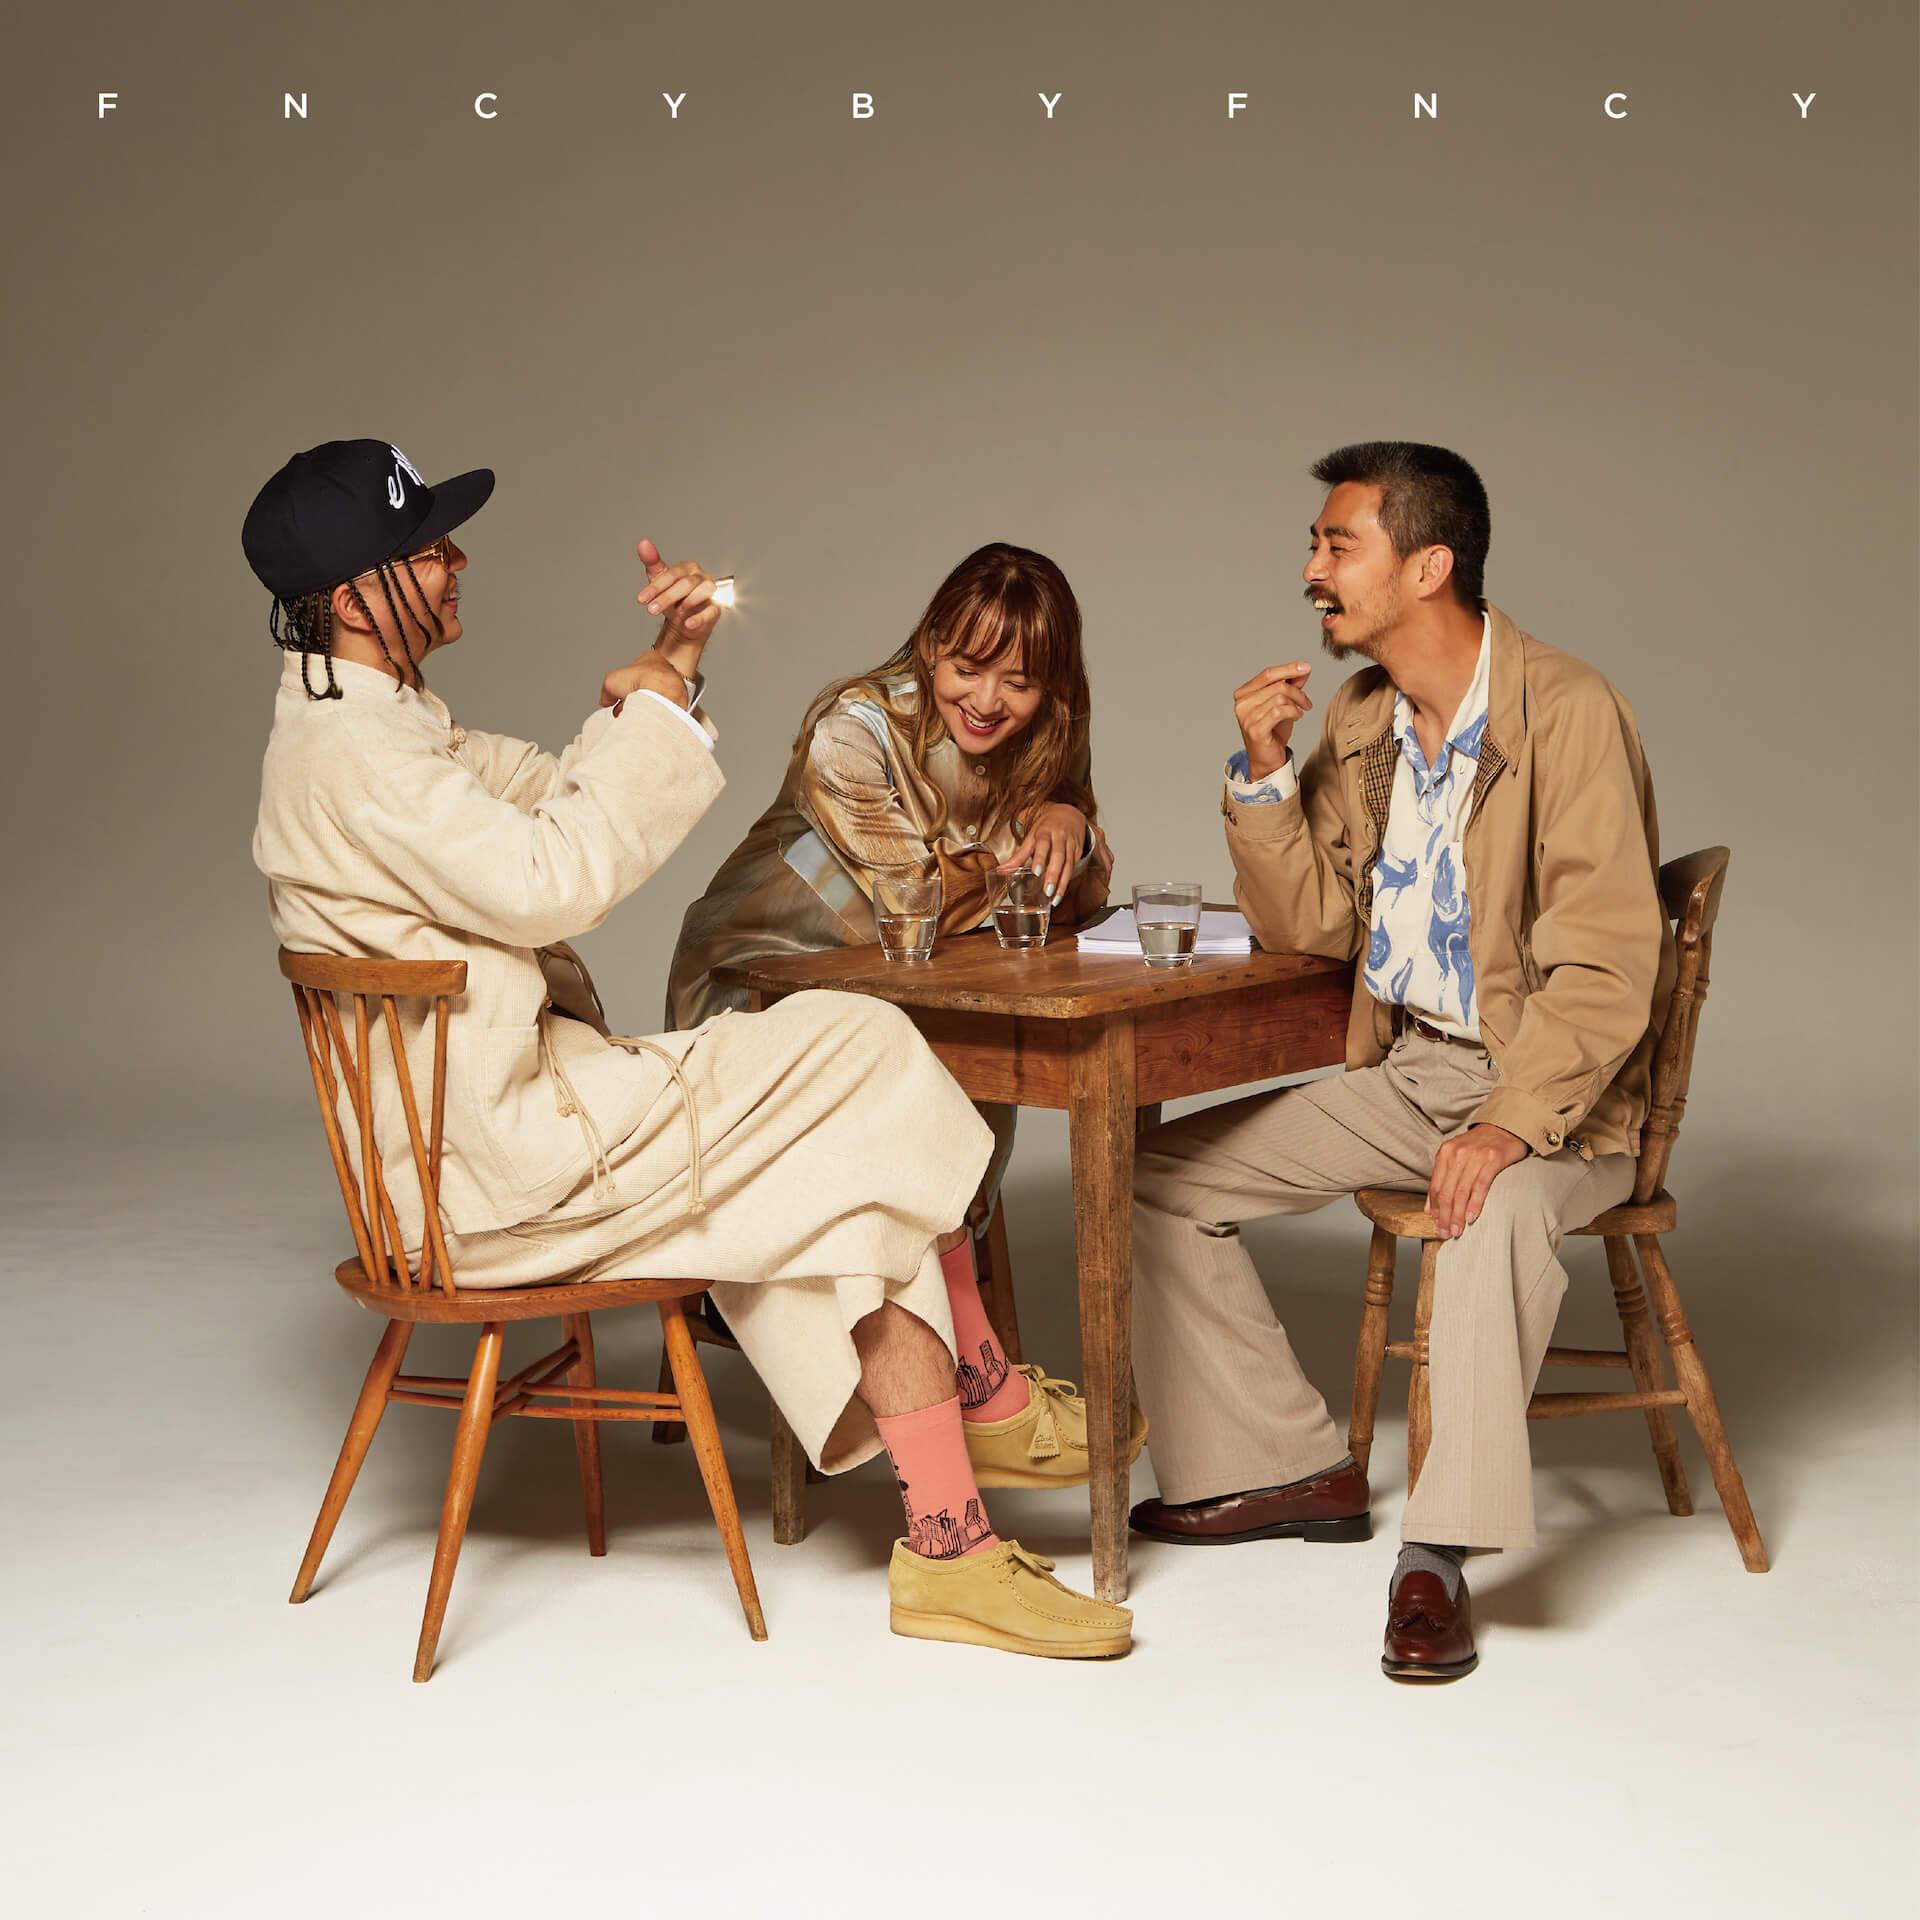 FNCYの2ndアルバムのタイトルが『FNCY BY FNCY』に決定!ジャケットアートも解禁&豪華特典も発表 music210806_fncy_4